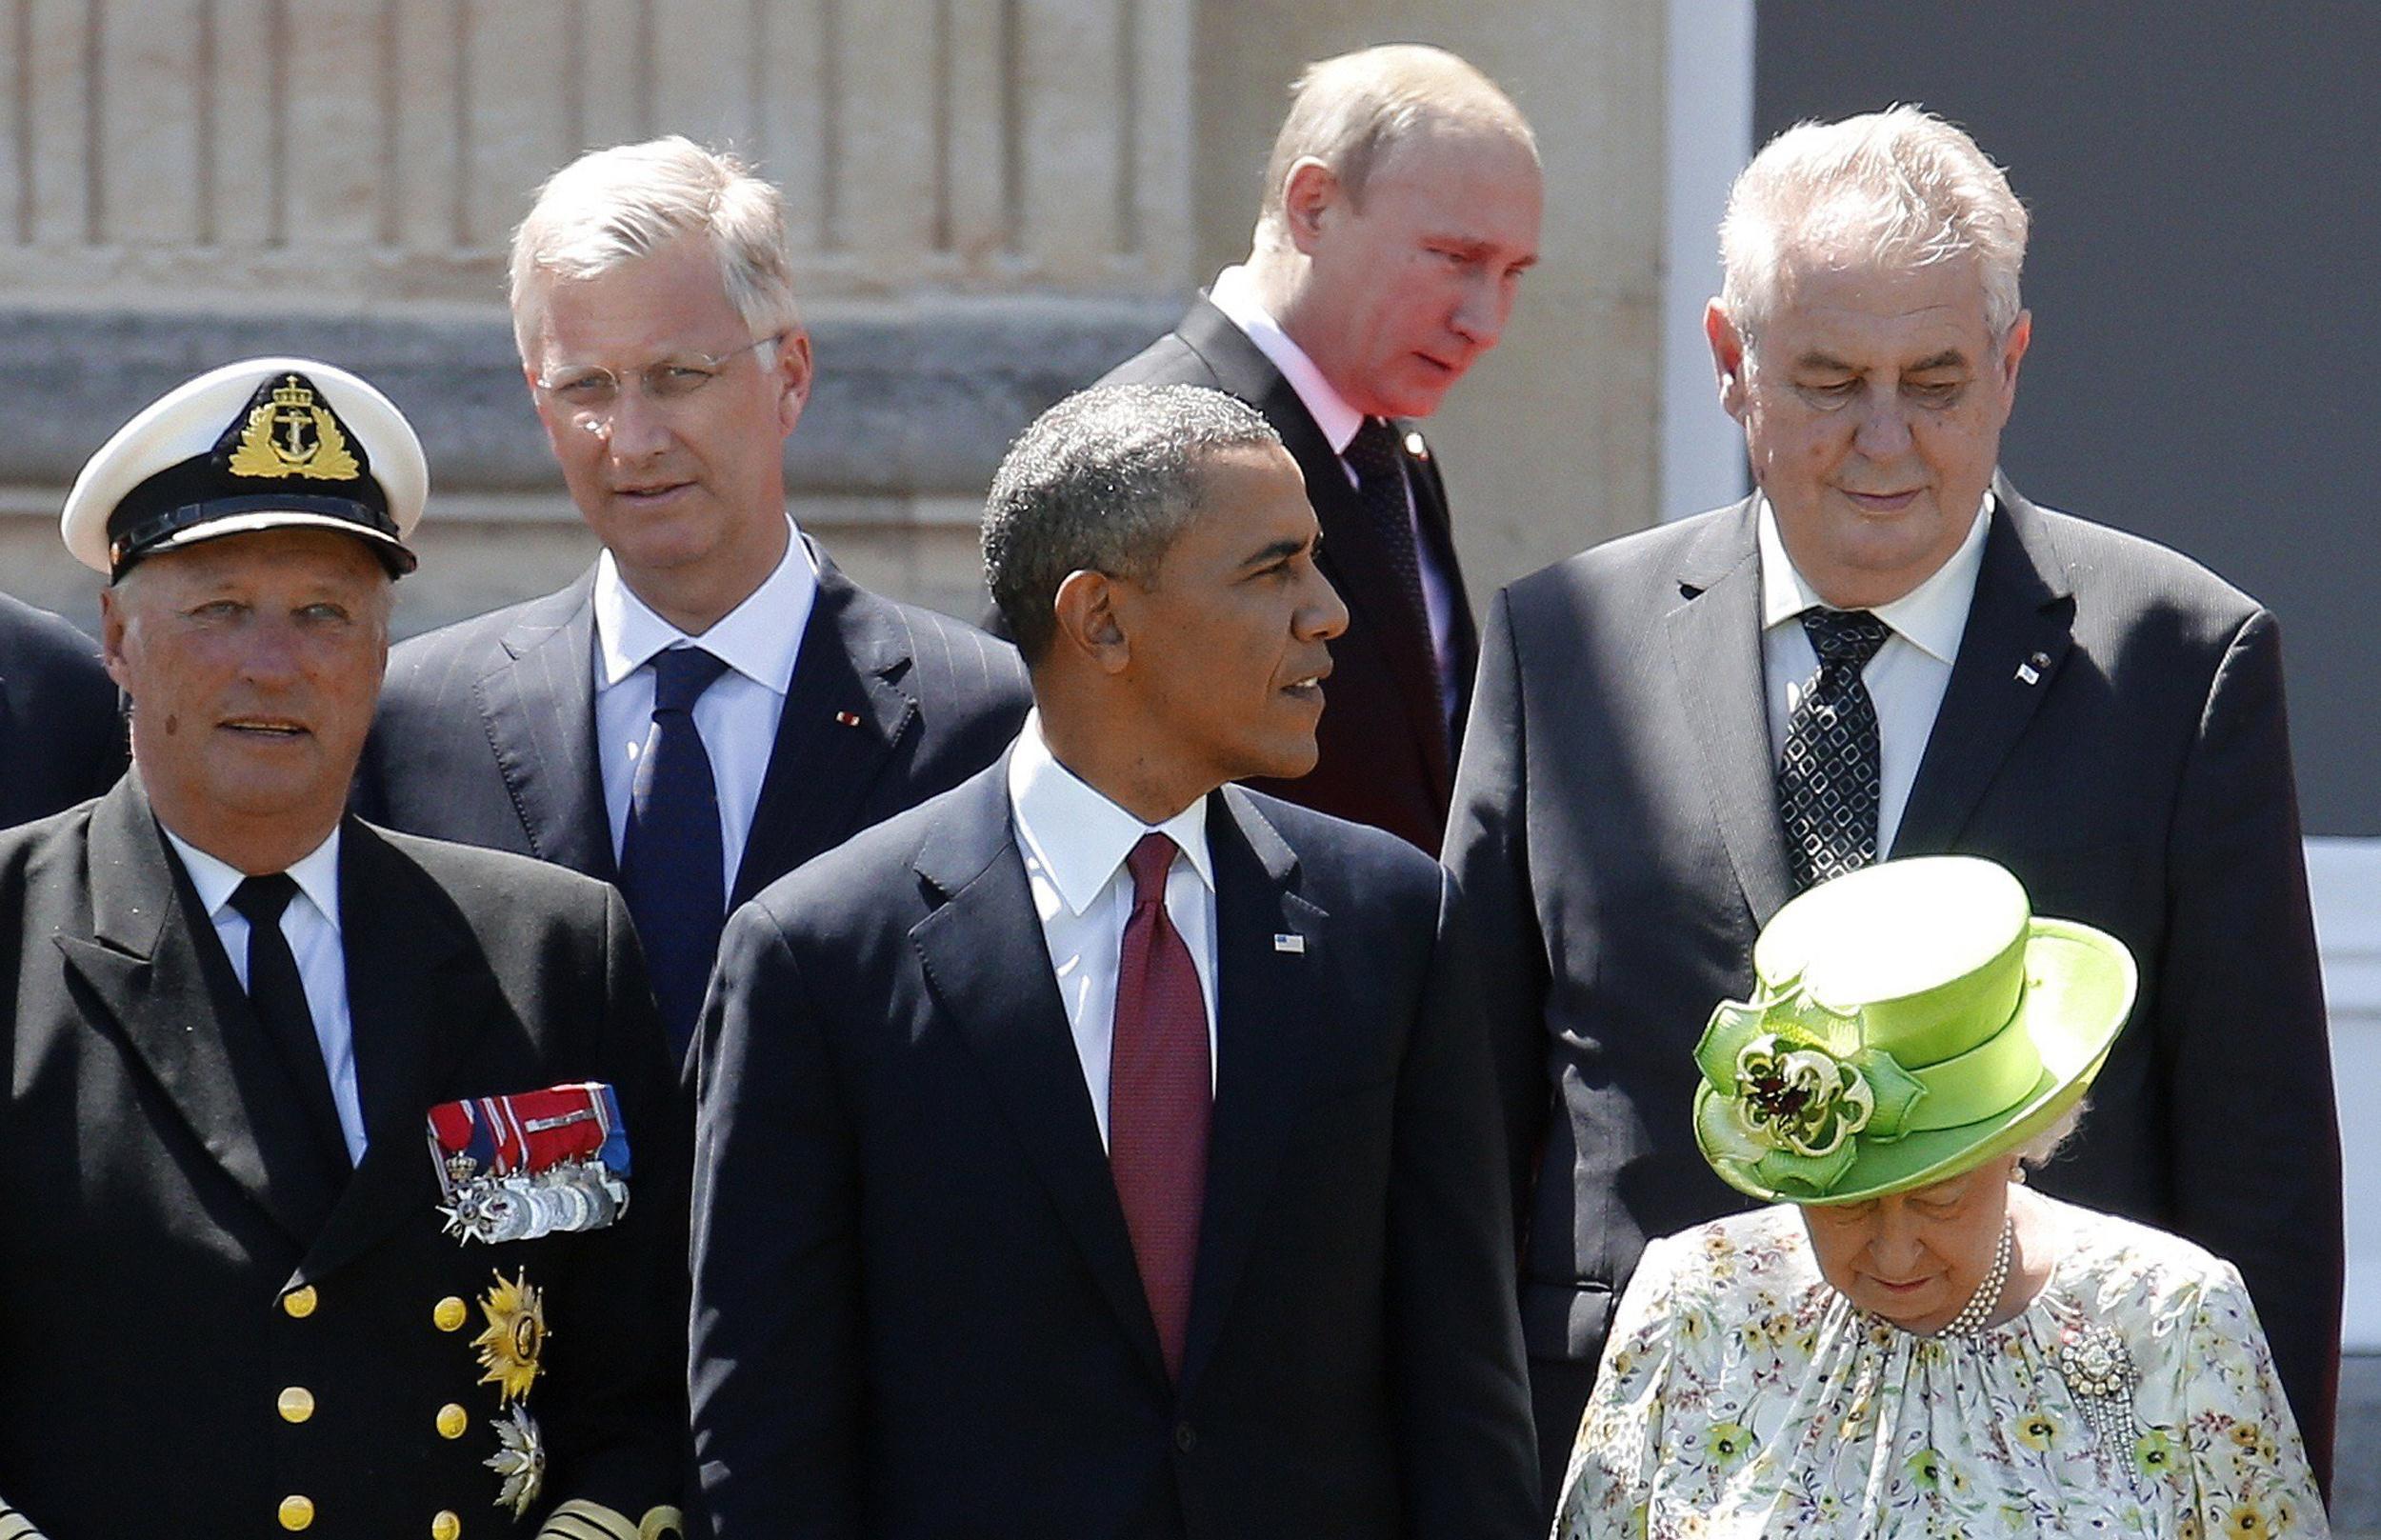 Image: Russian President Vladimir Putin passes behind President Barack Obama